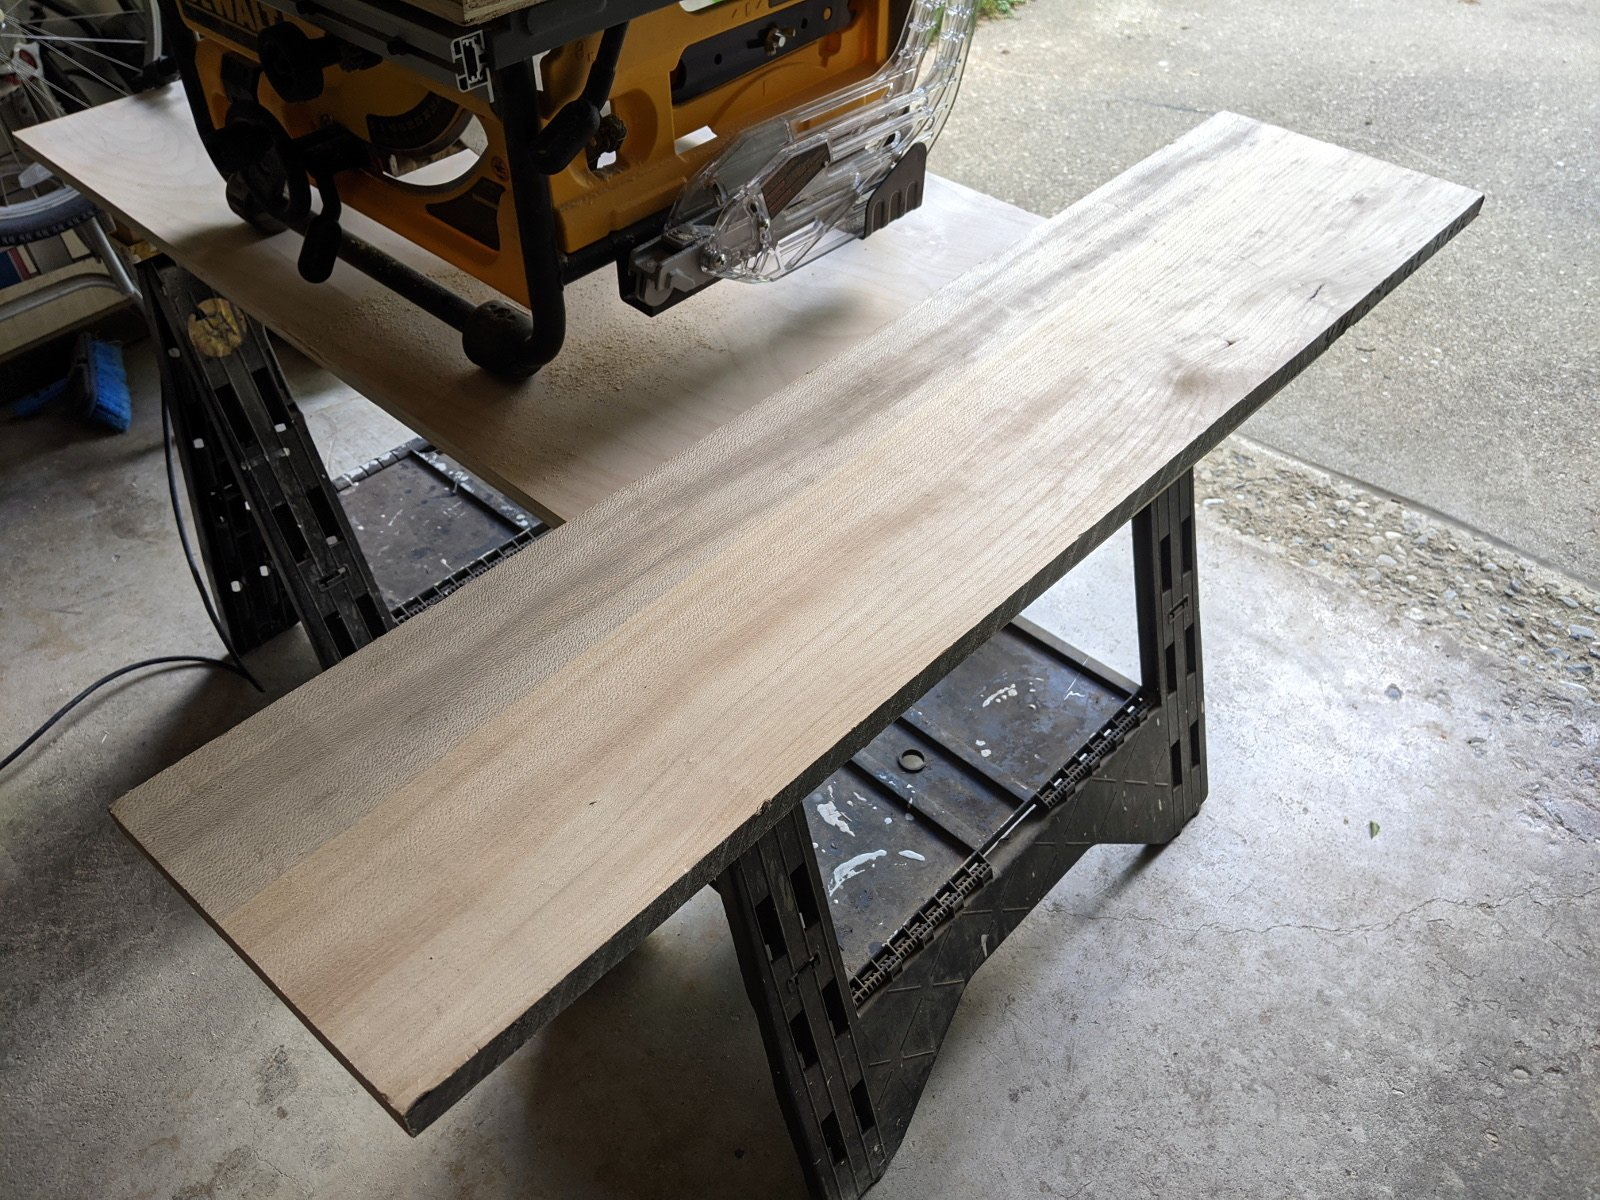 sycamore plank.jpg